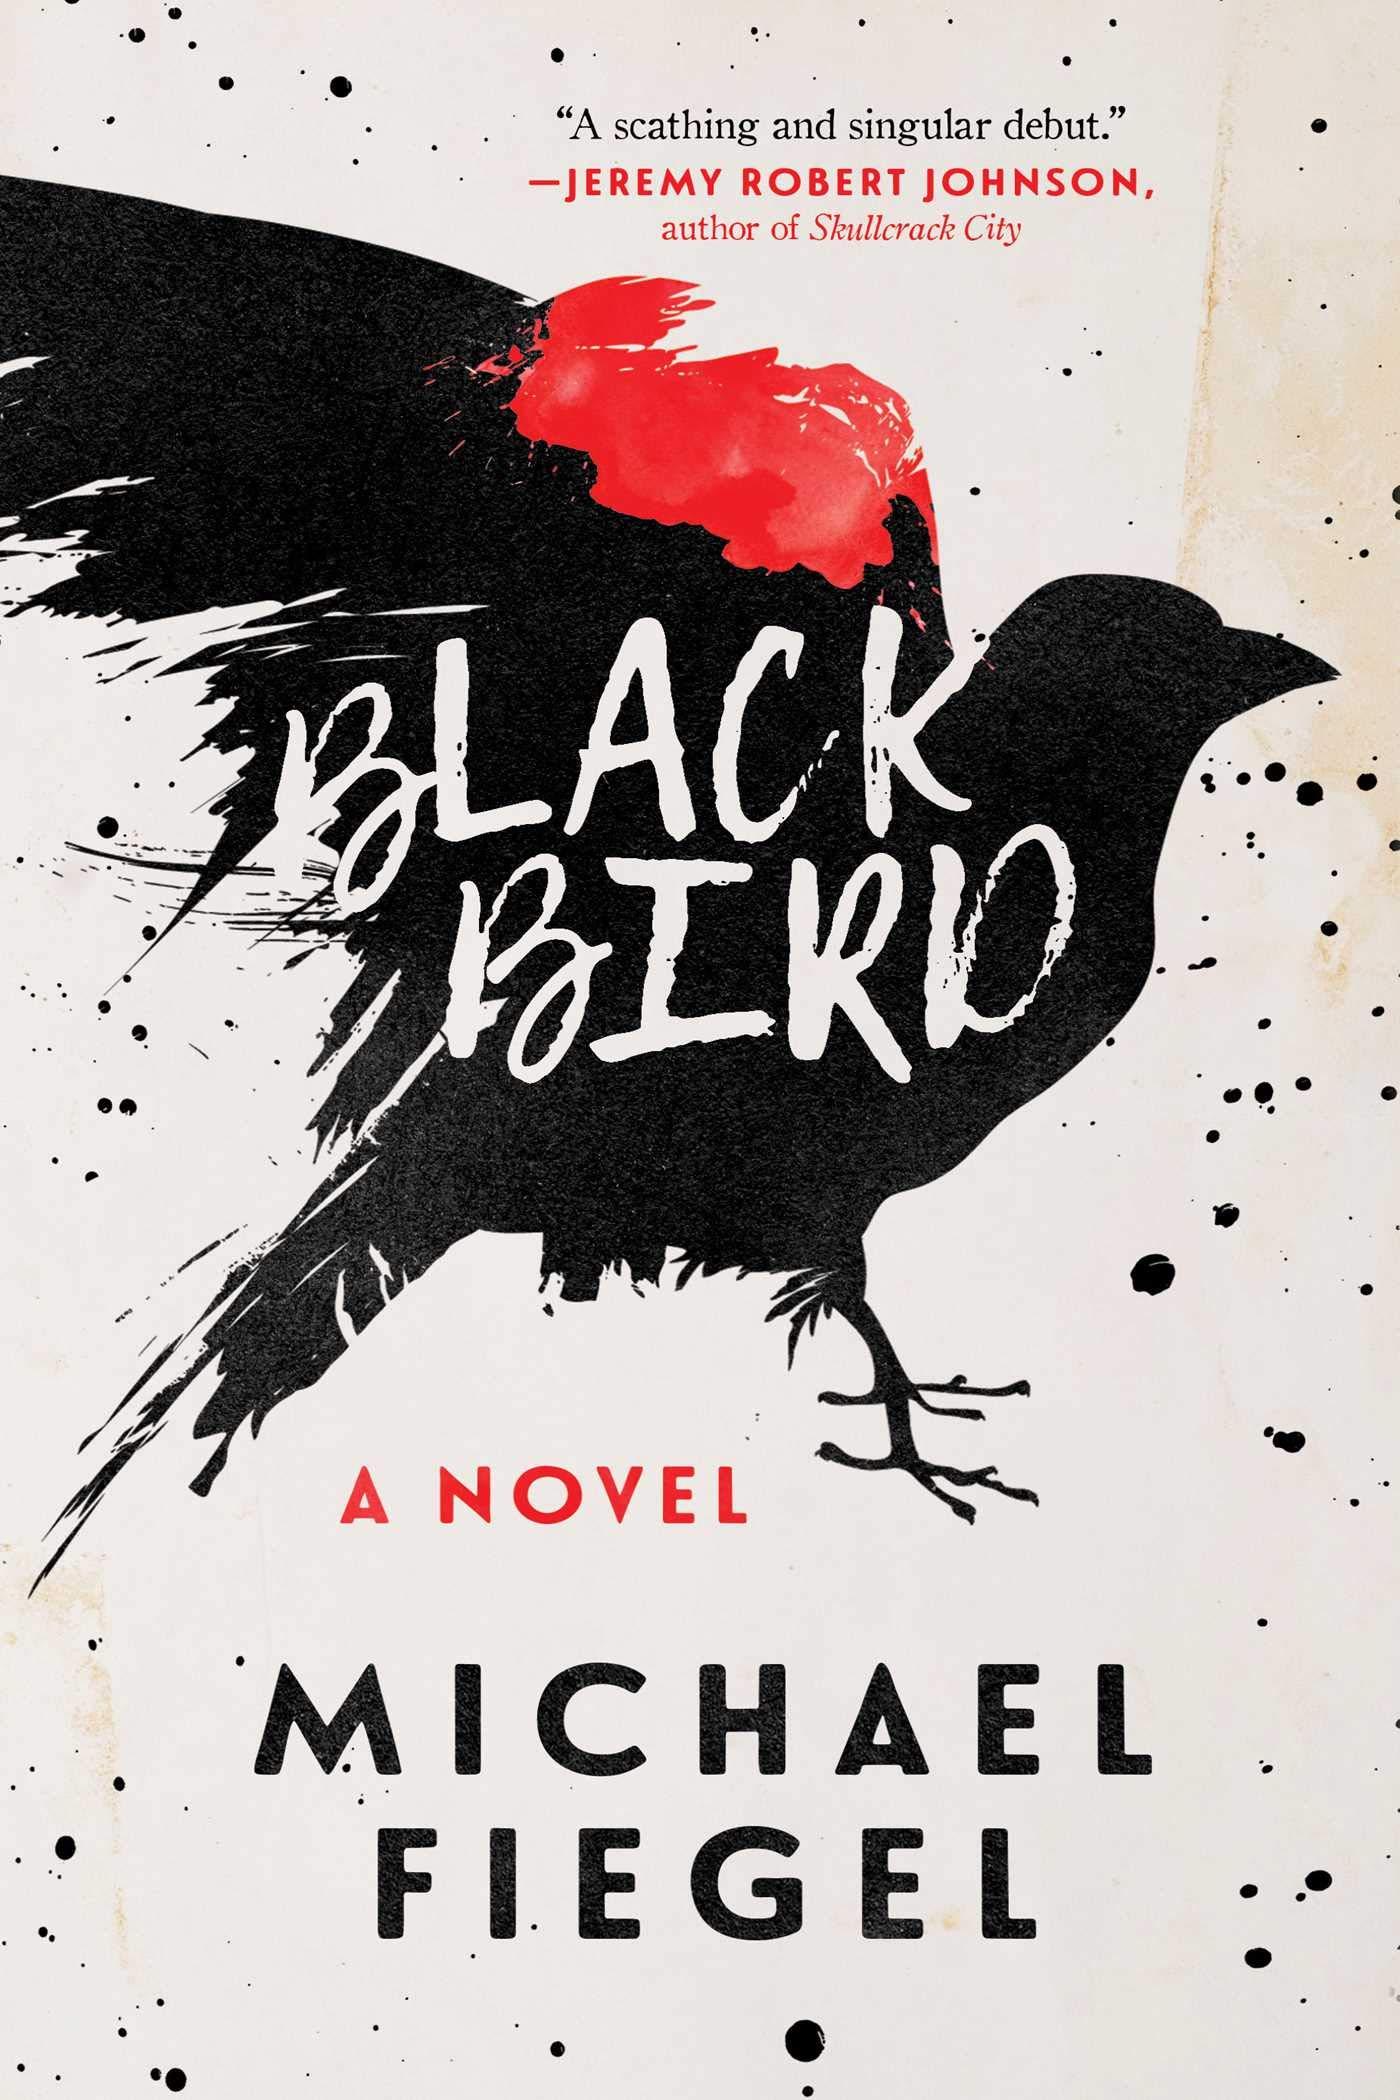 Amazon.com: Blackbird: A Novel (9781510723559): Michael ...